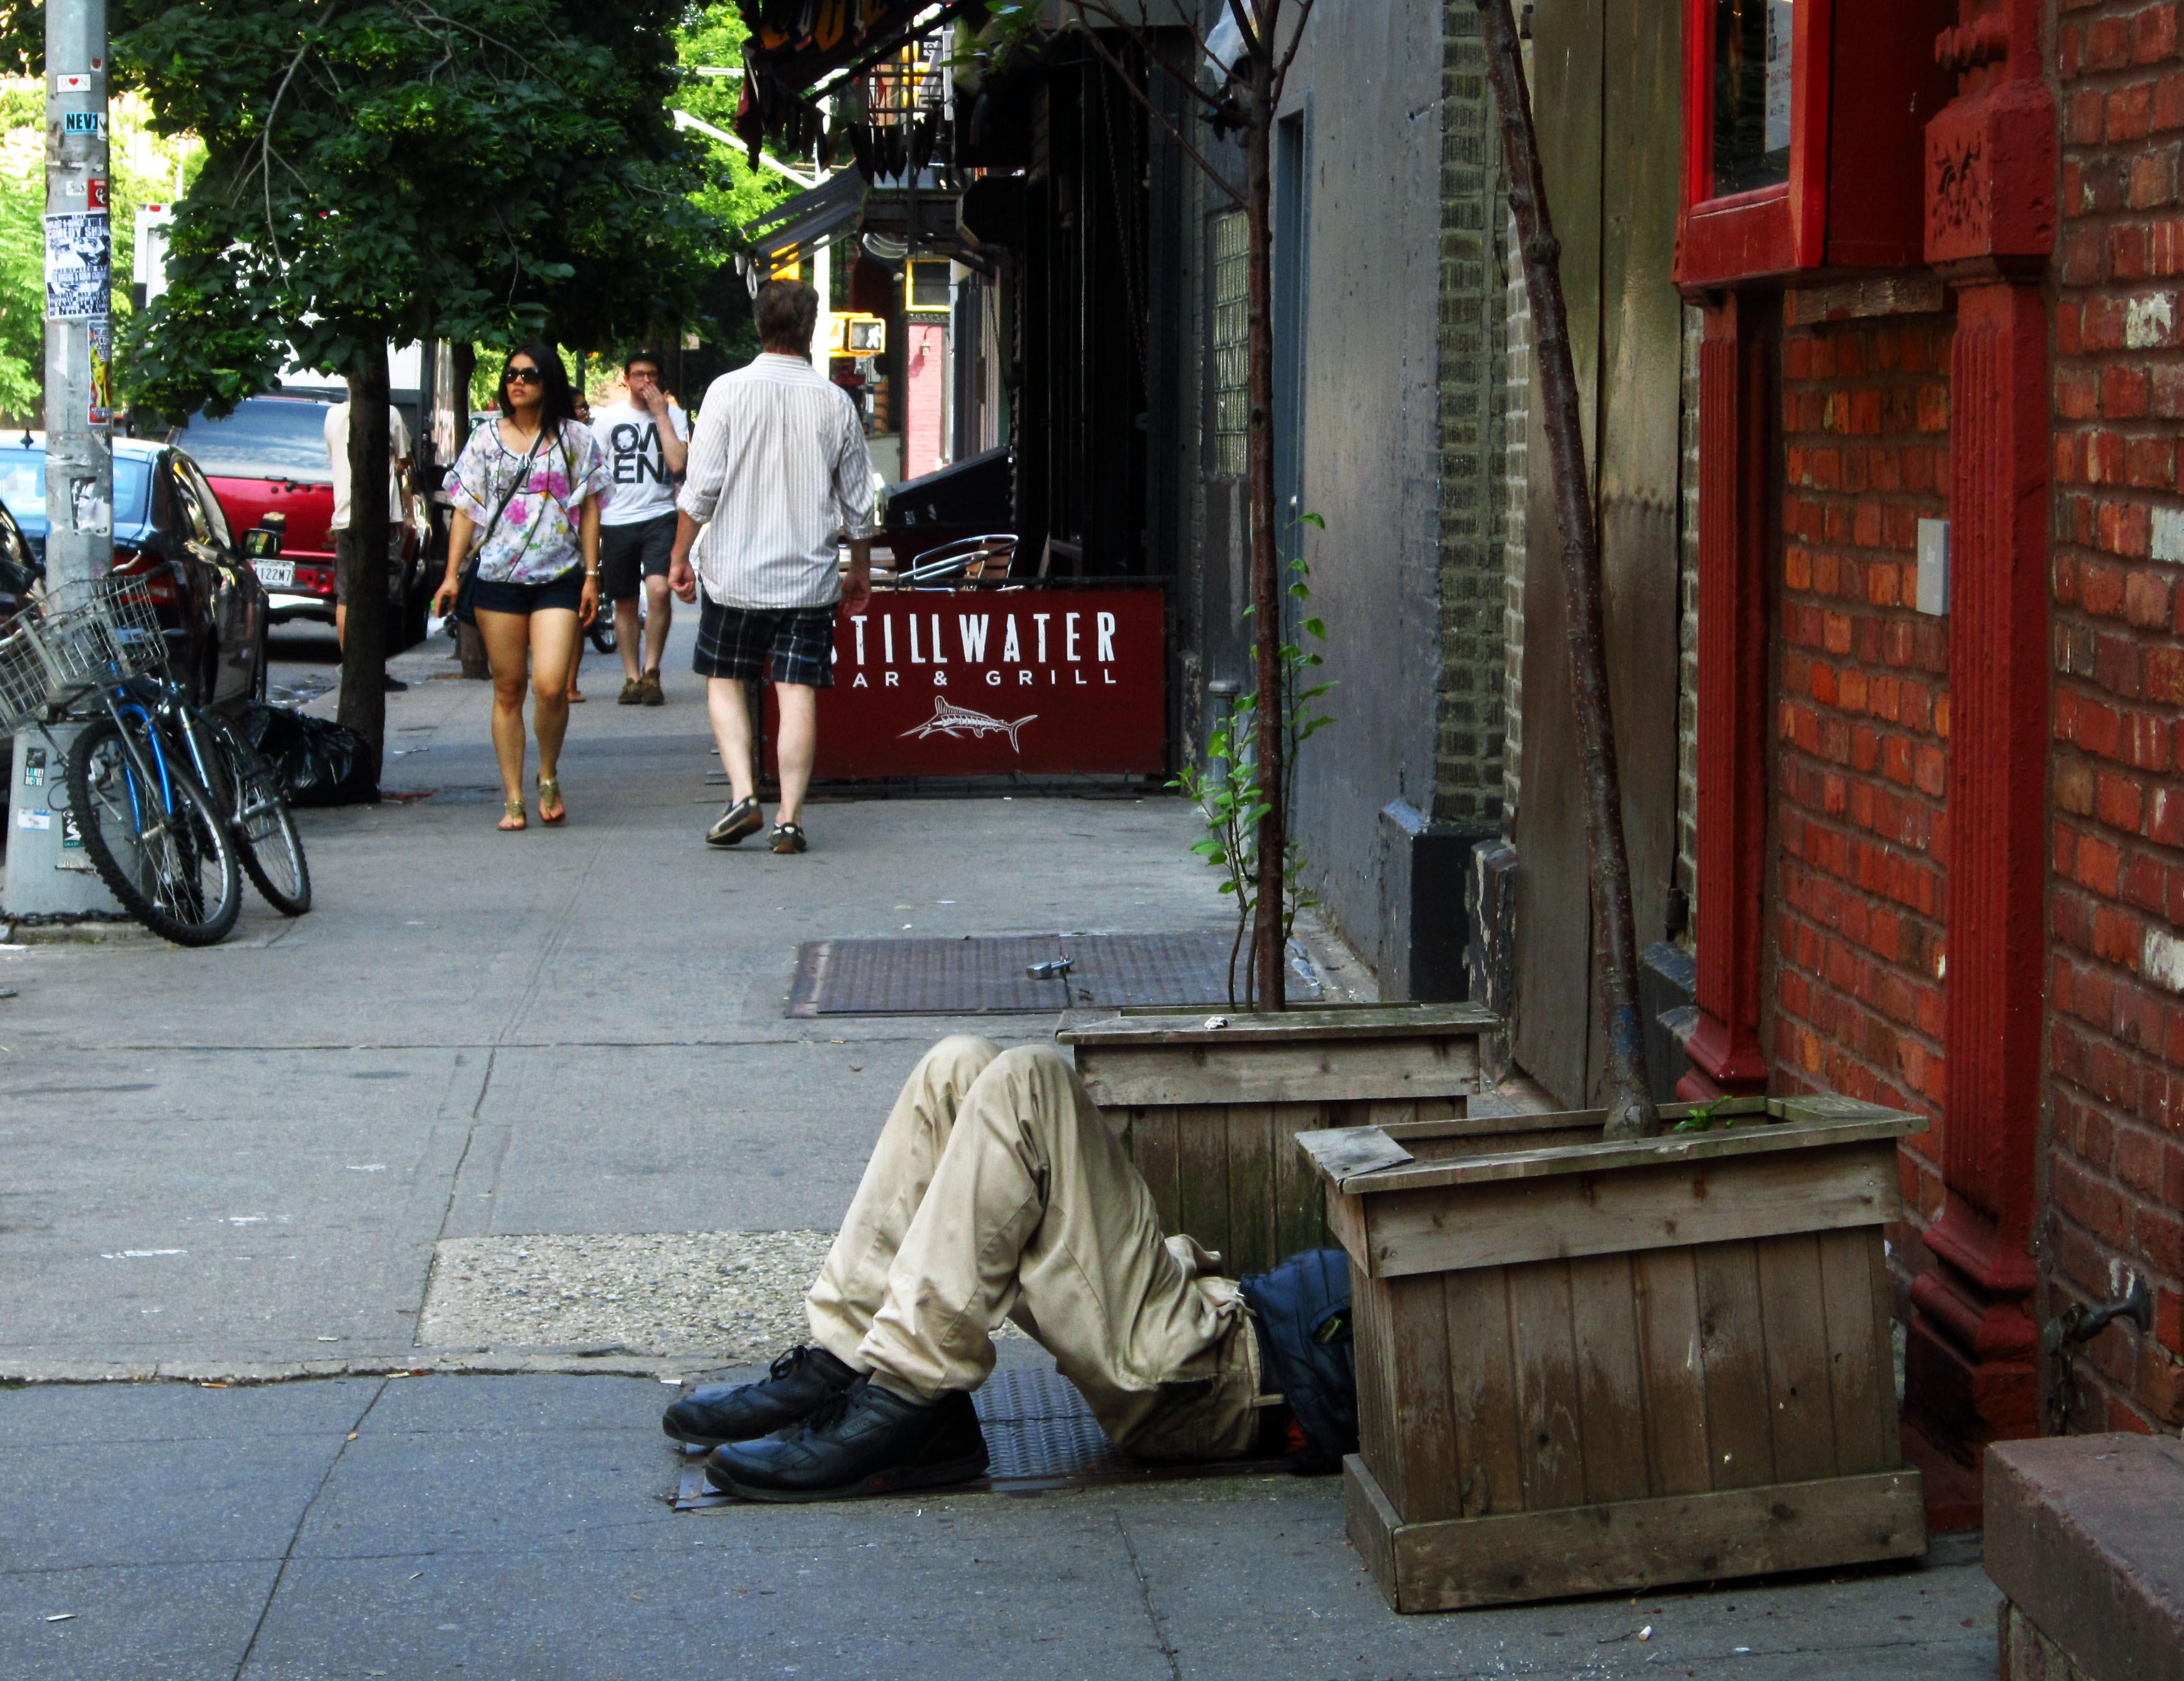 Sidewalk siesta